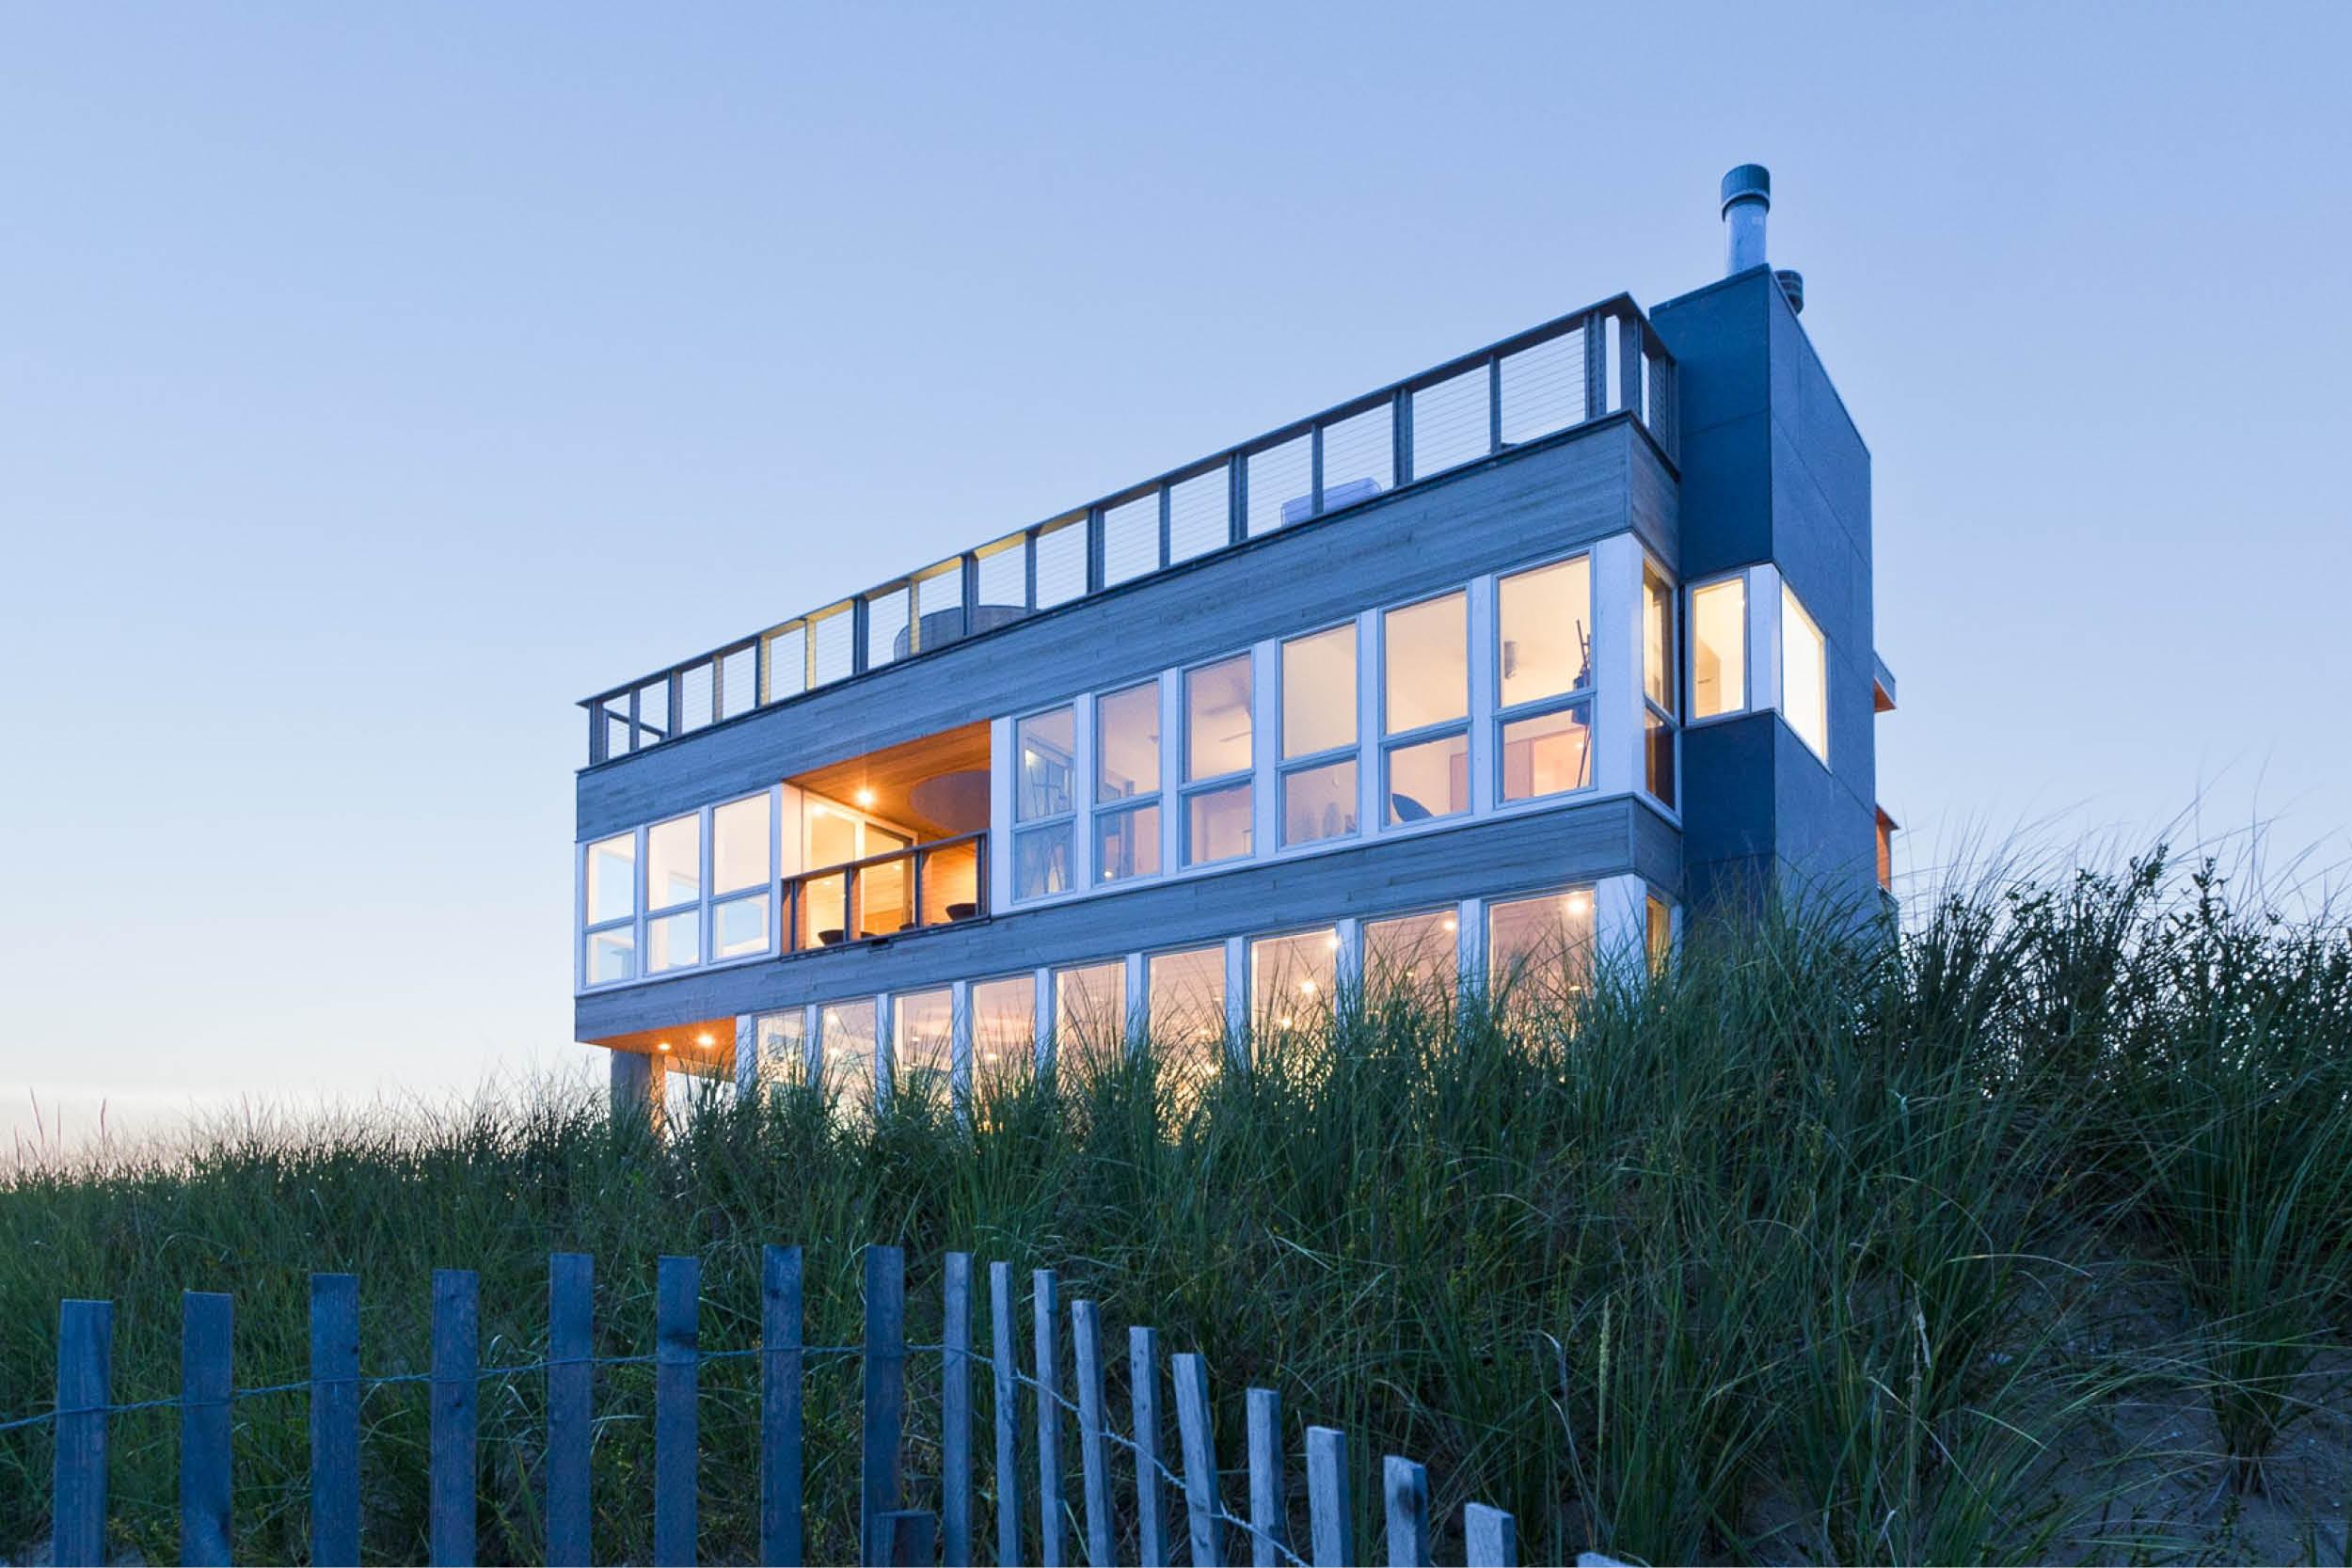 02-res4-resolution-4-architecture-modern-modular-home-prefab-dune-road-beach-house-exterior.jpg